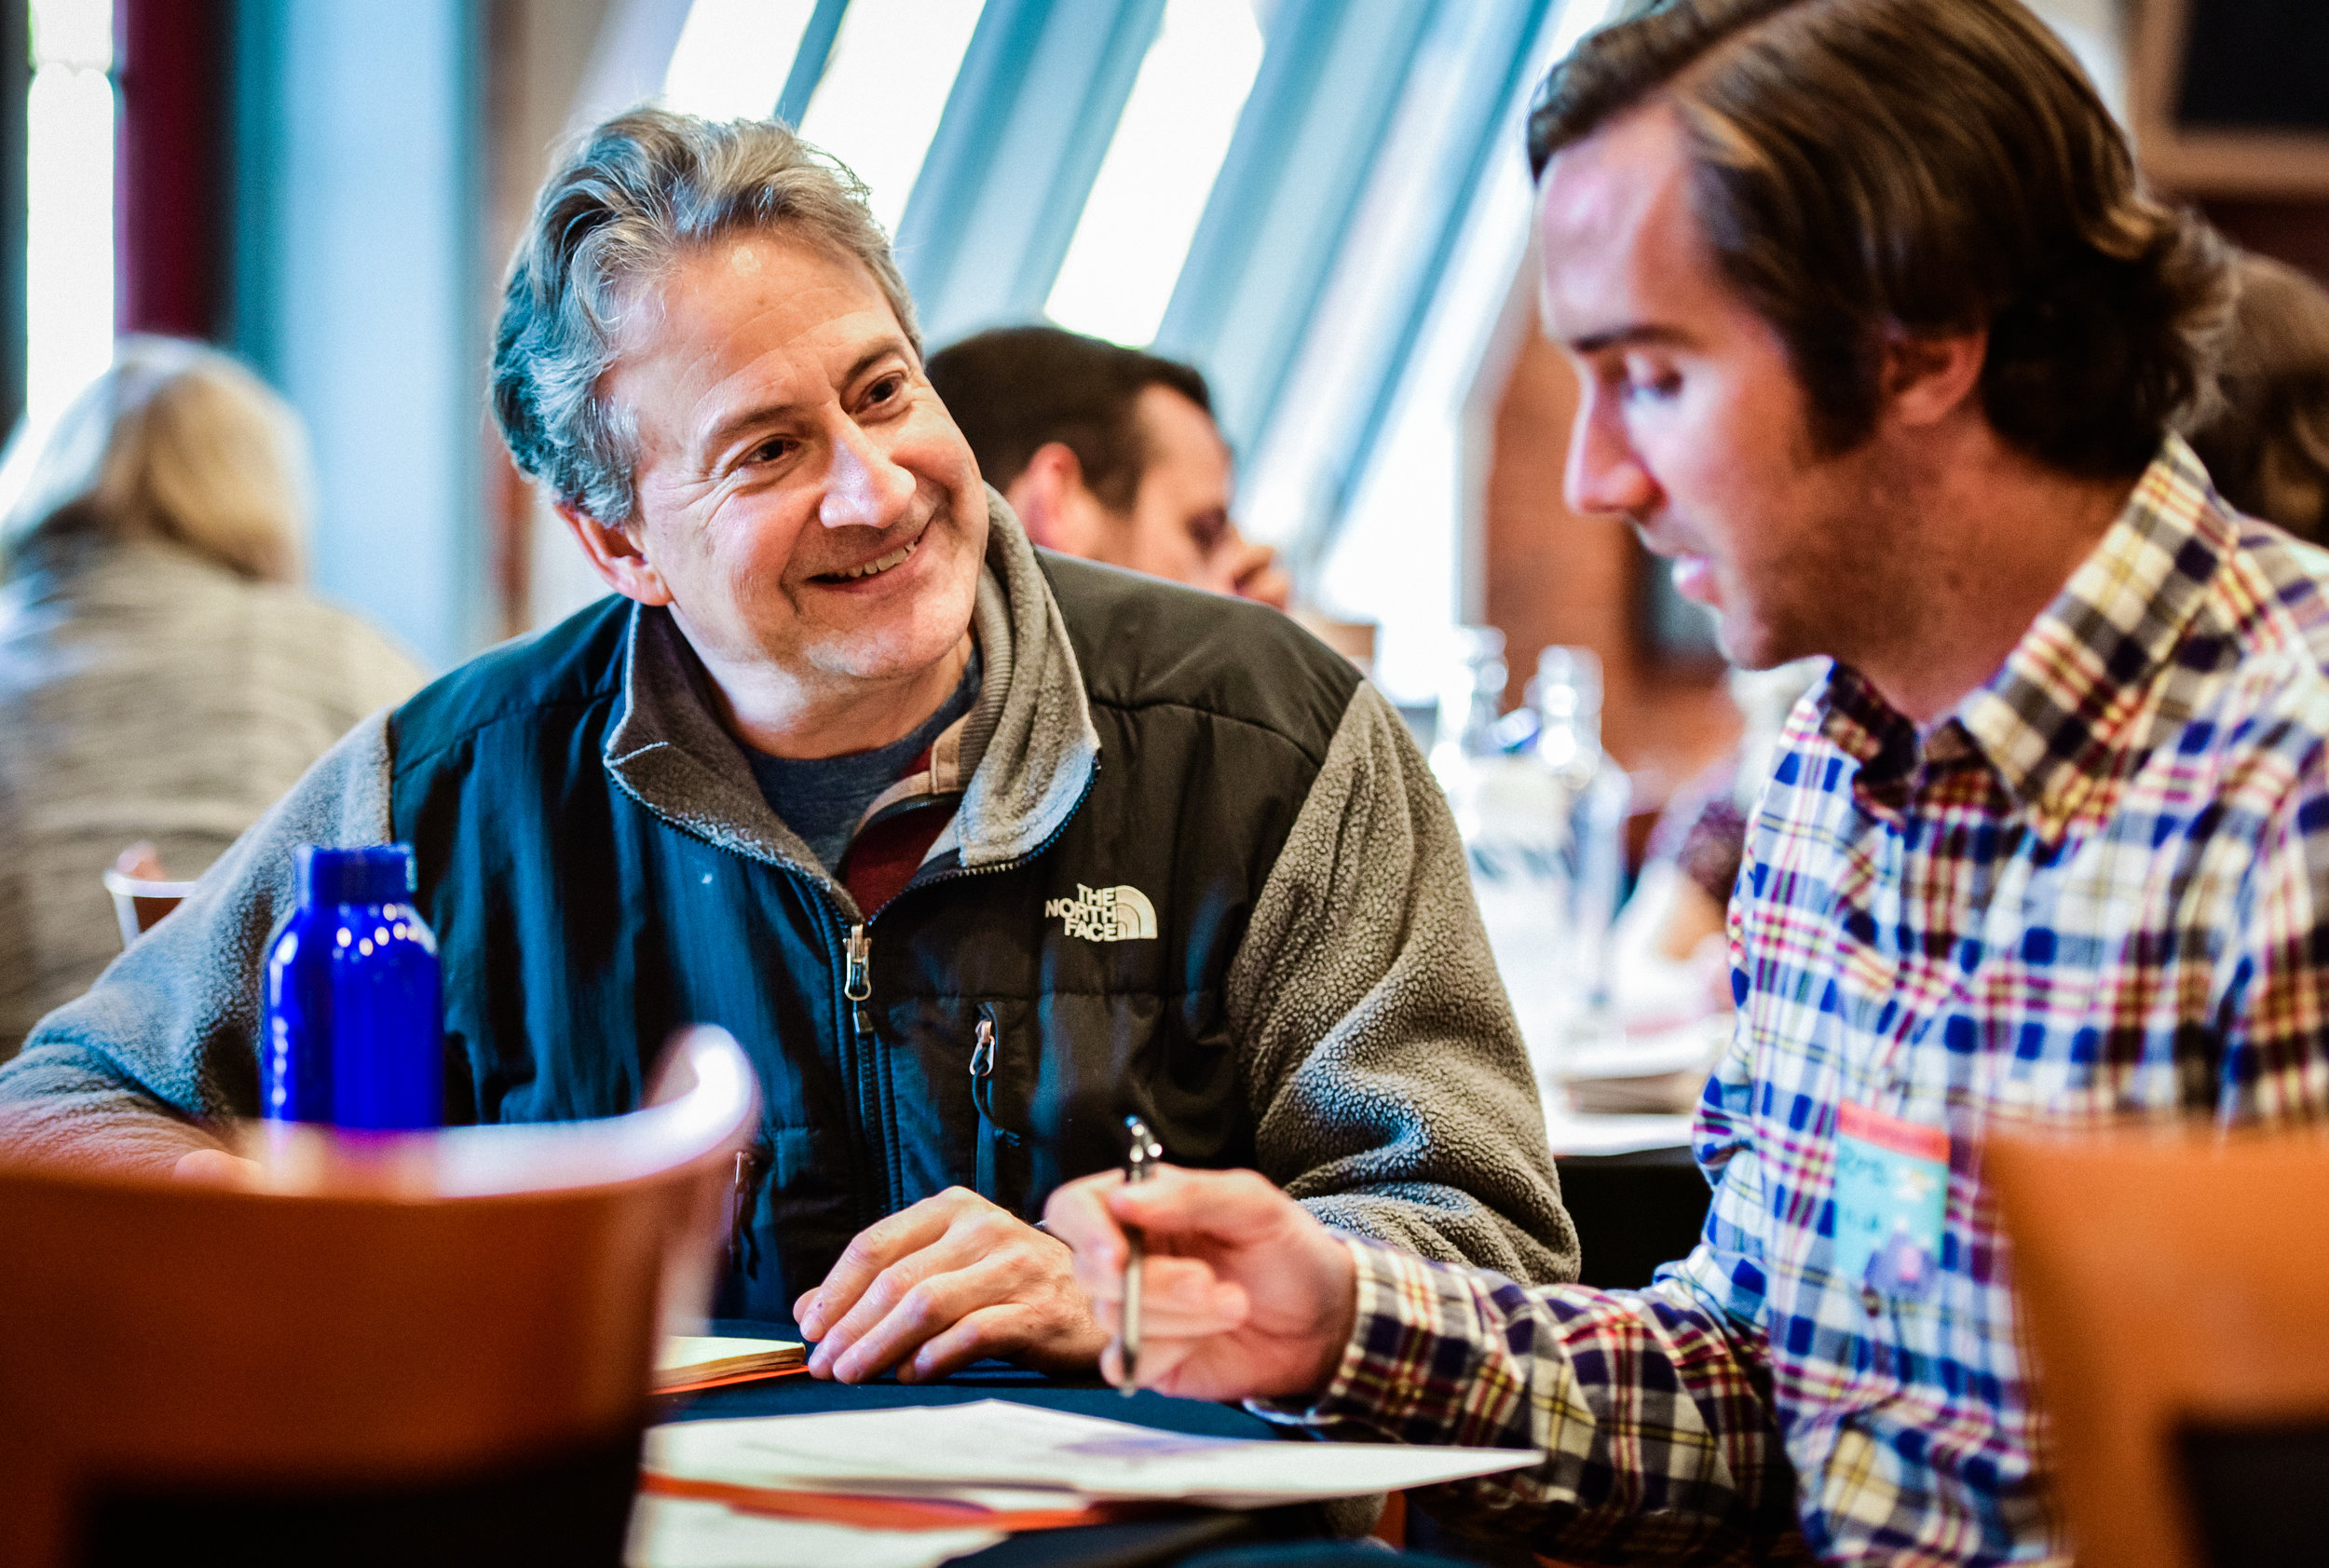 User Interview participants